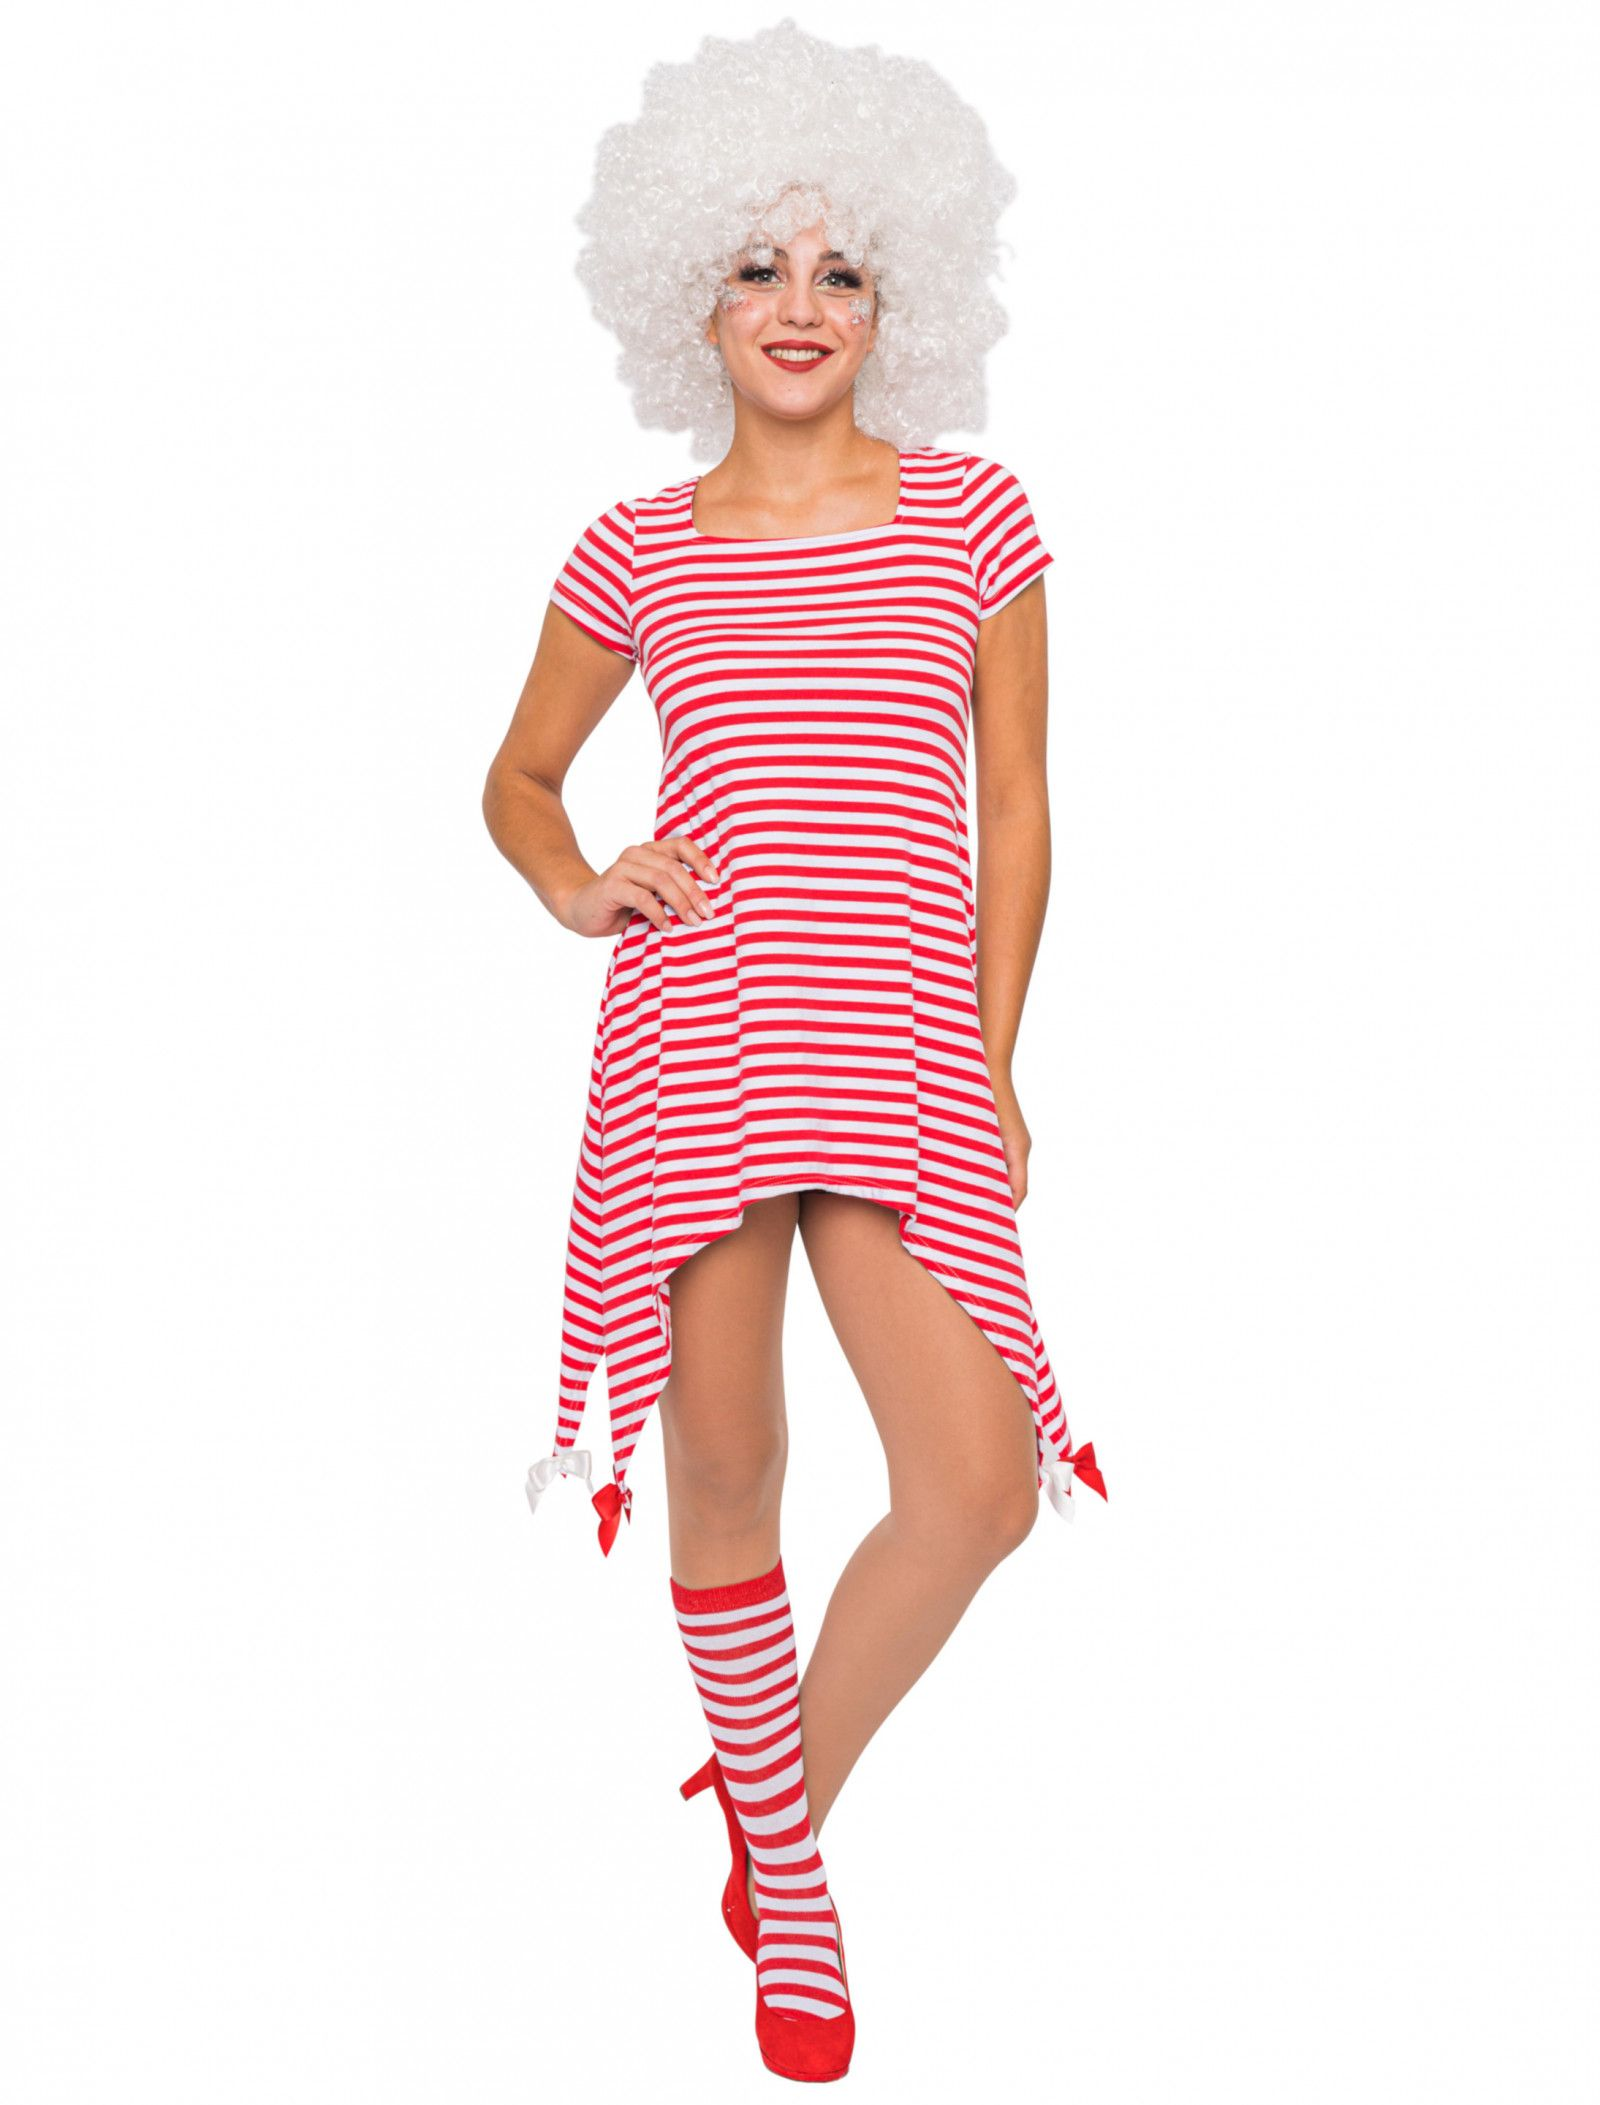 deiters kostüm clown tunika rot-weiß | rot weiss, lange